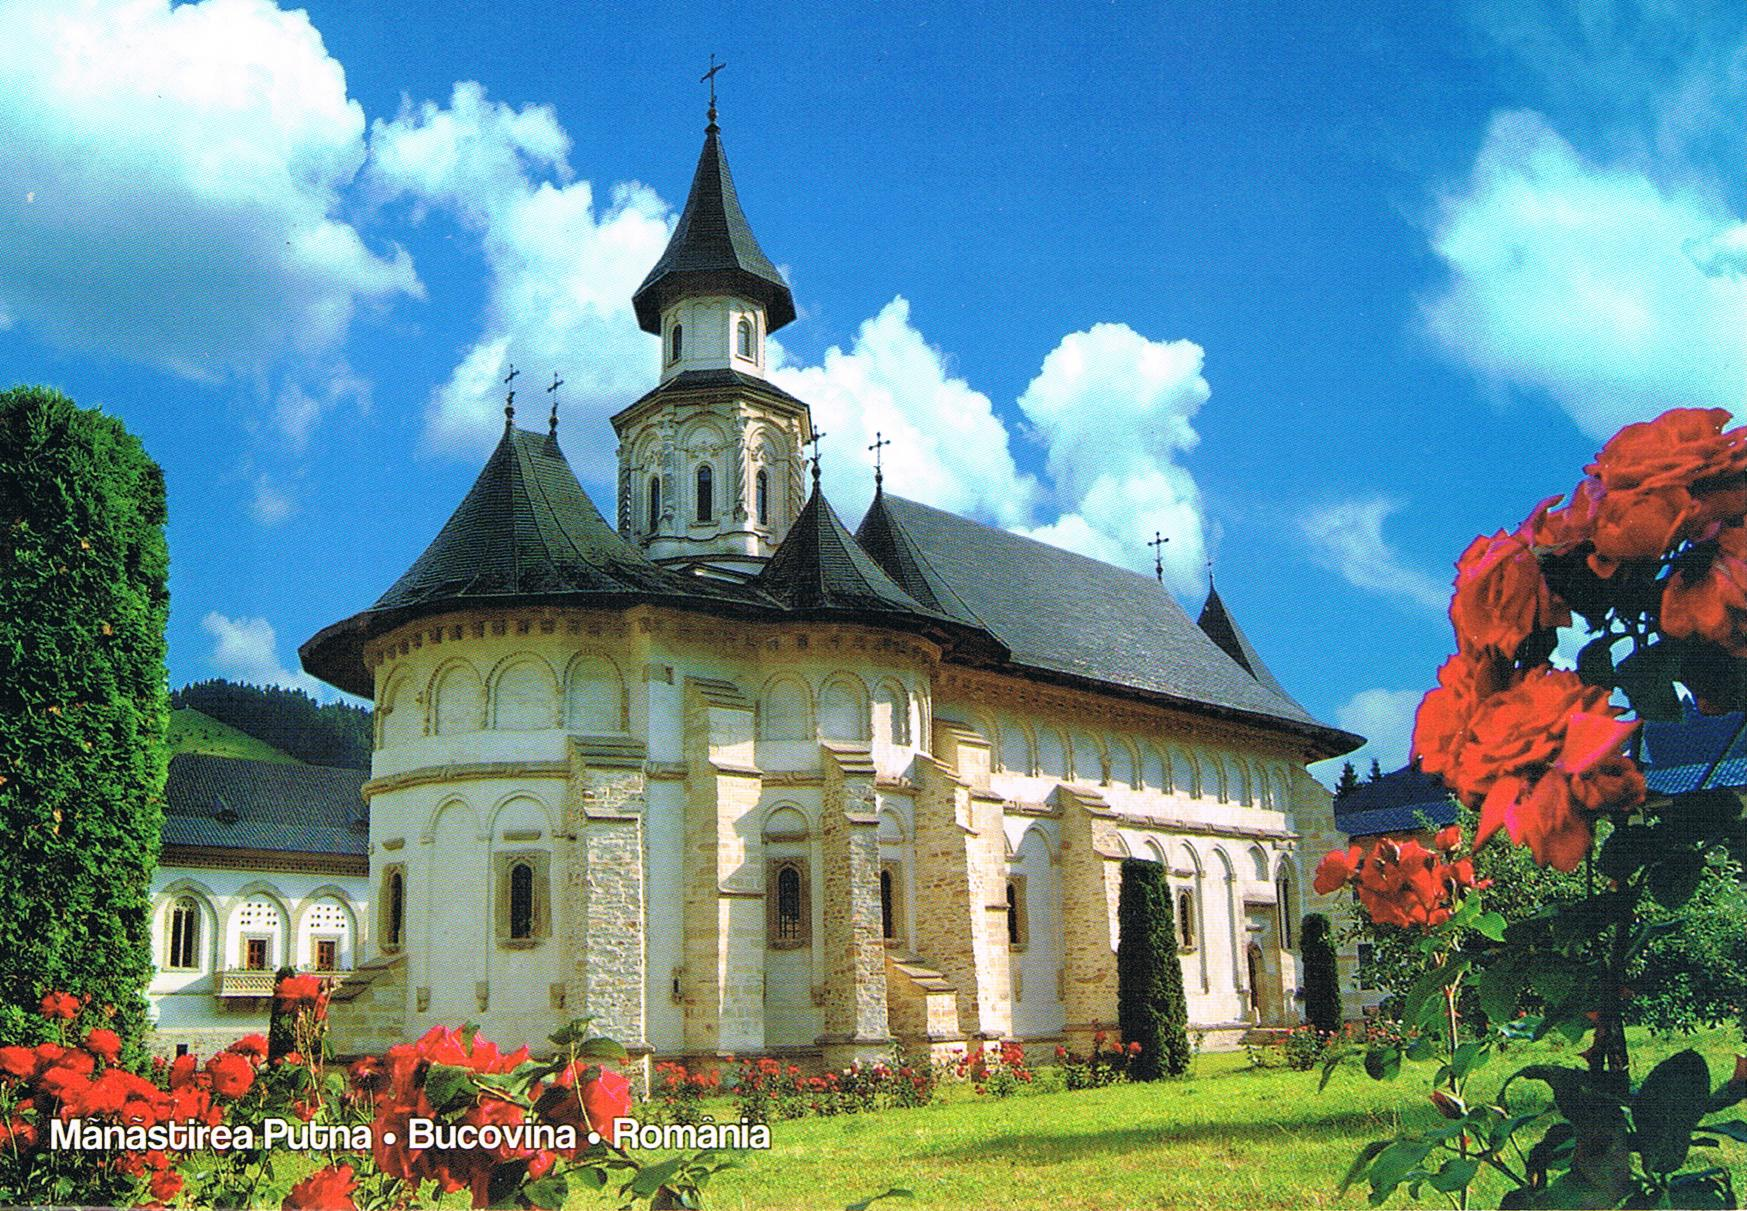 Klosterkirche Putna in Bukowina